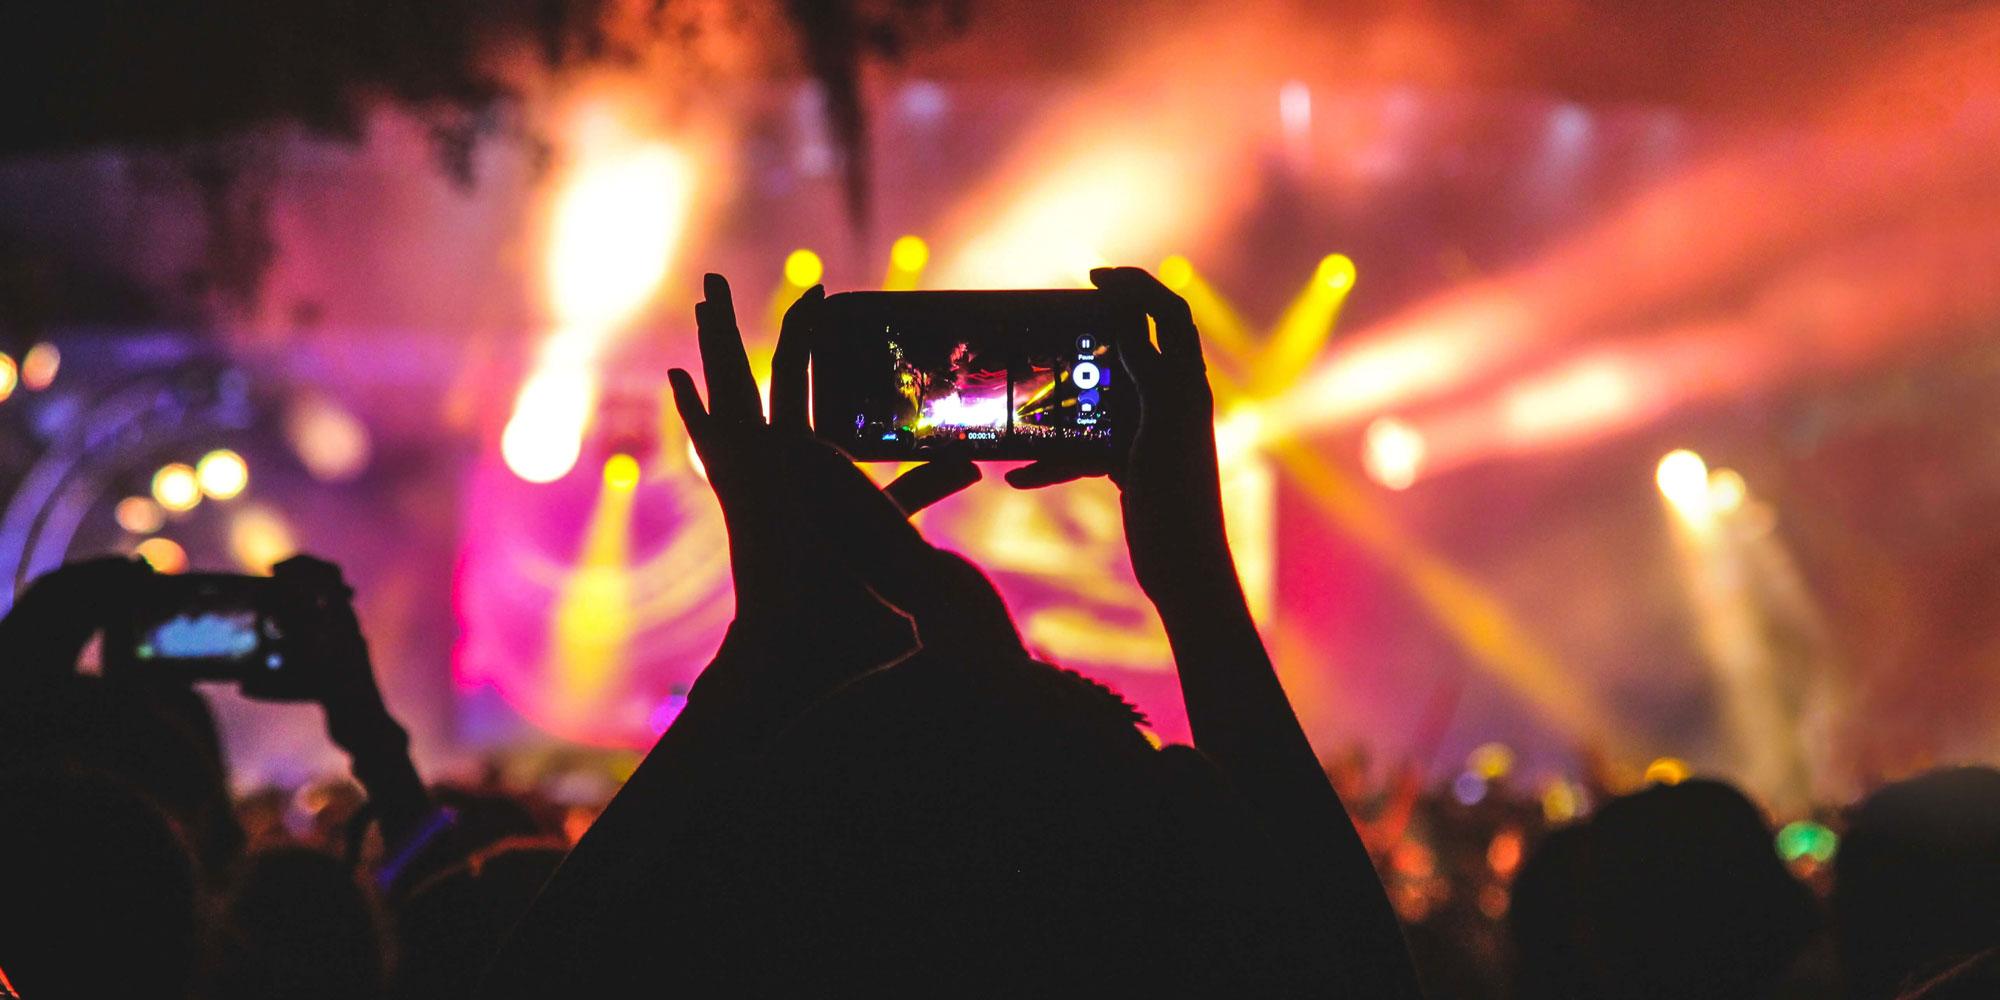 TimEvents 2020 app – Mobile Summer 4.0